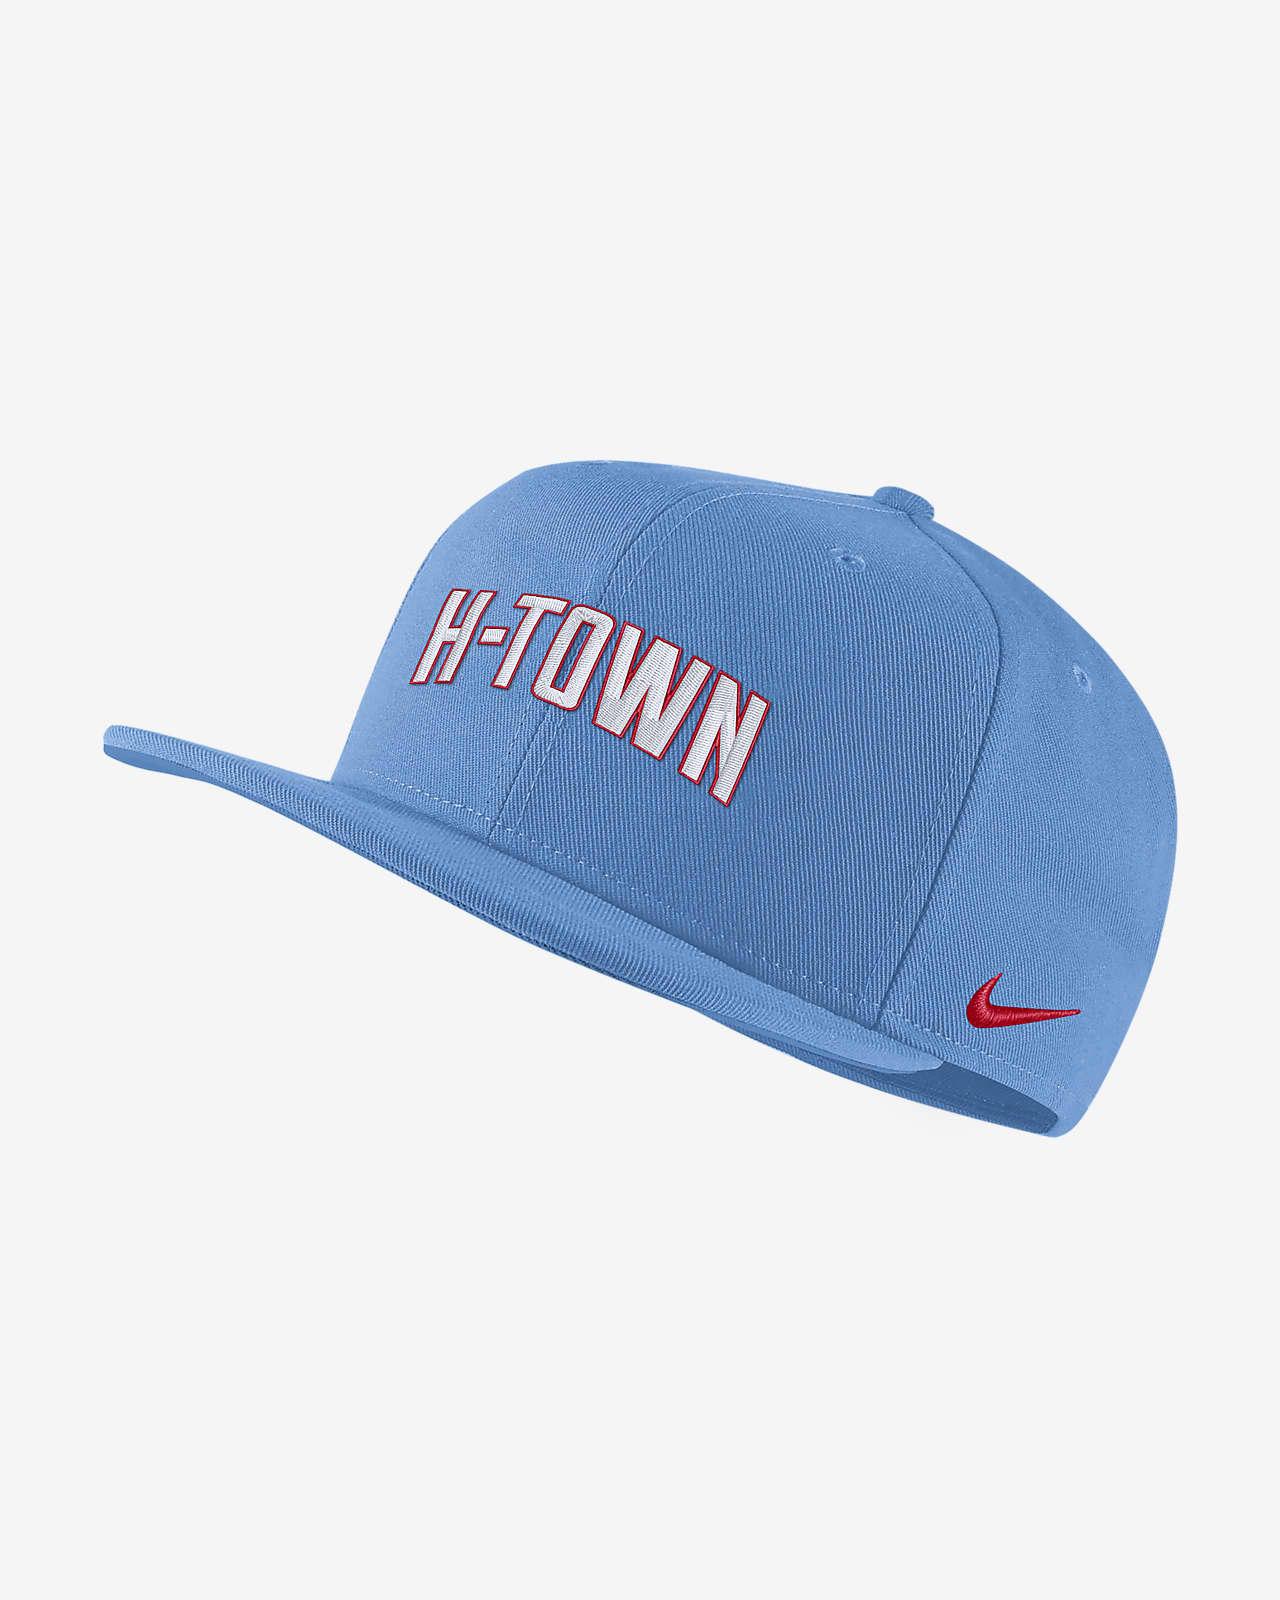 Houston Rockets City Edition Nike Pro NBA Cap